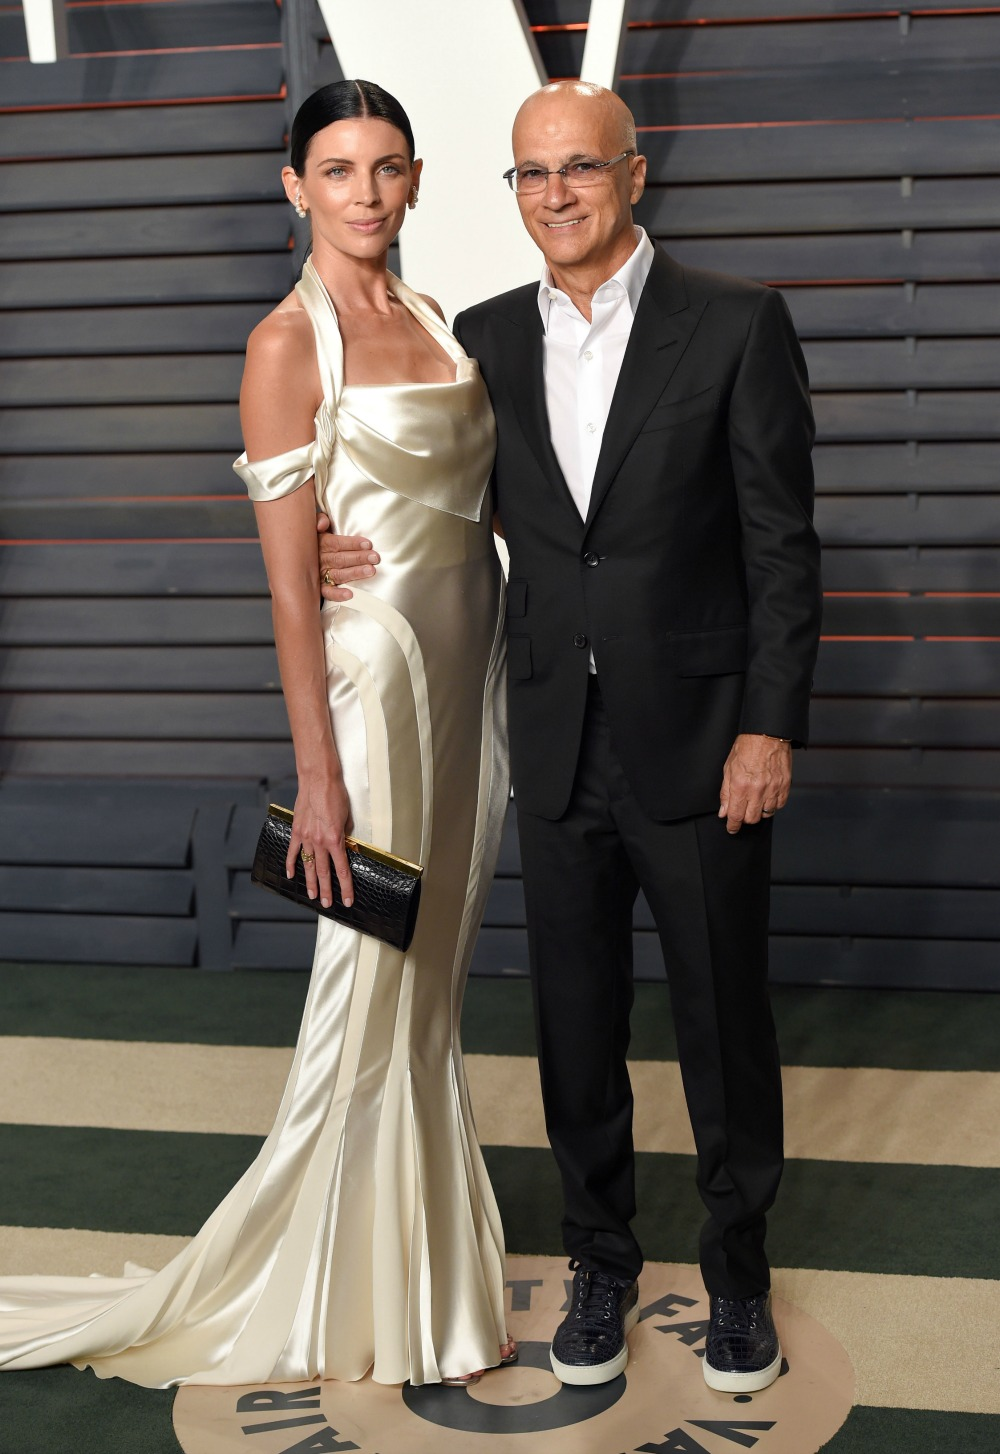 liberty-ross-oscars-wedding-dress-getty